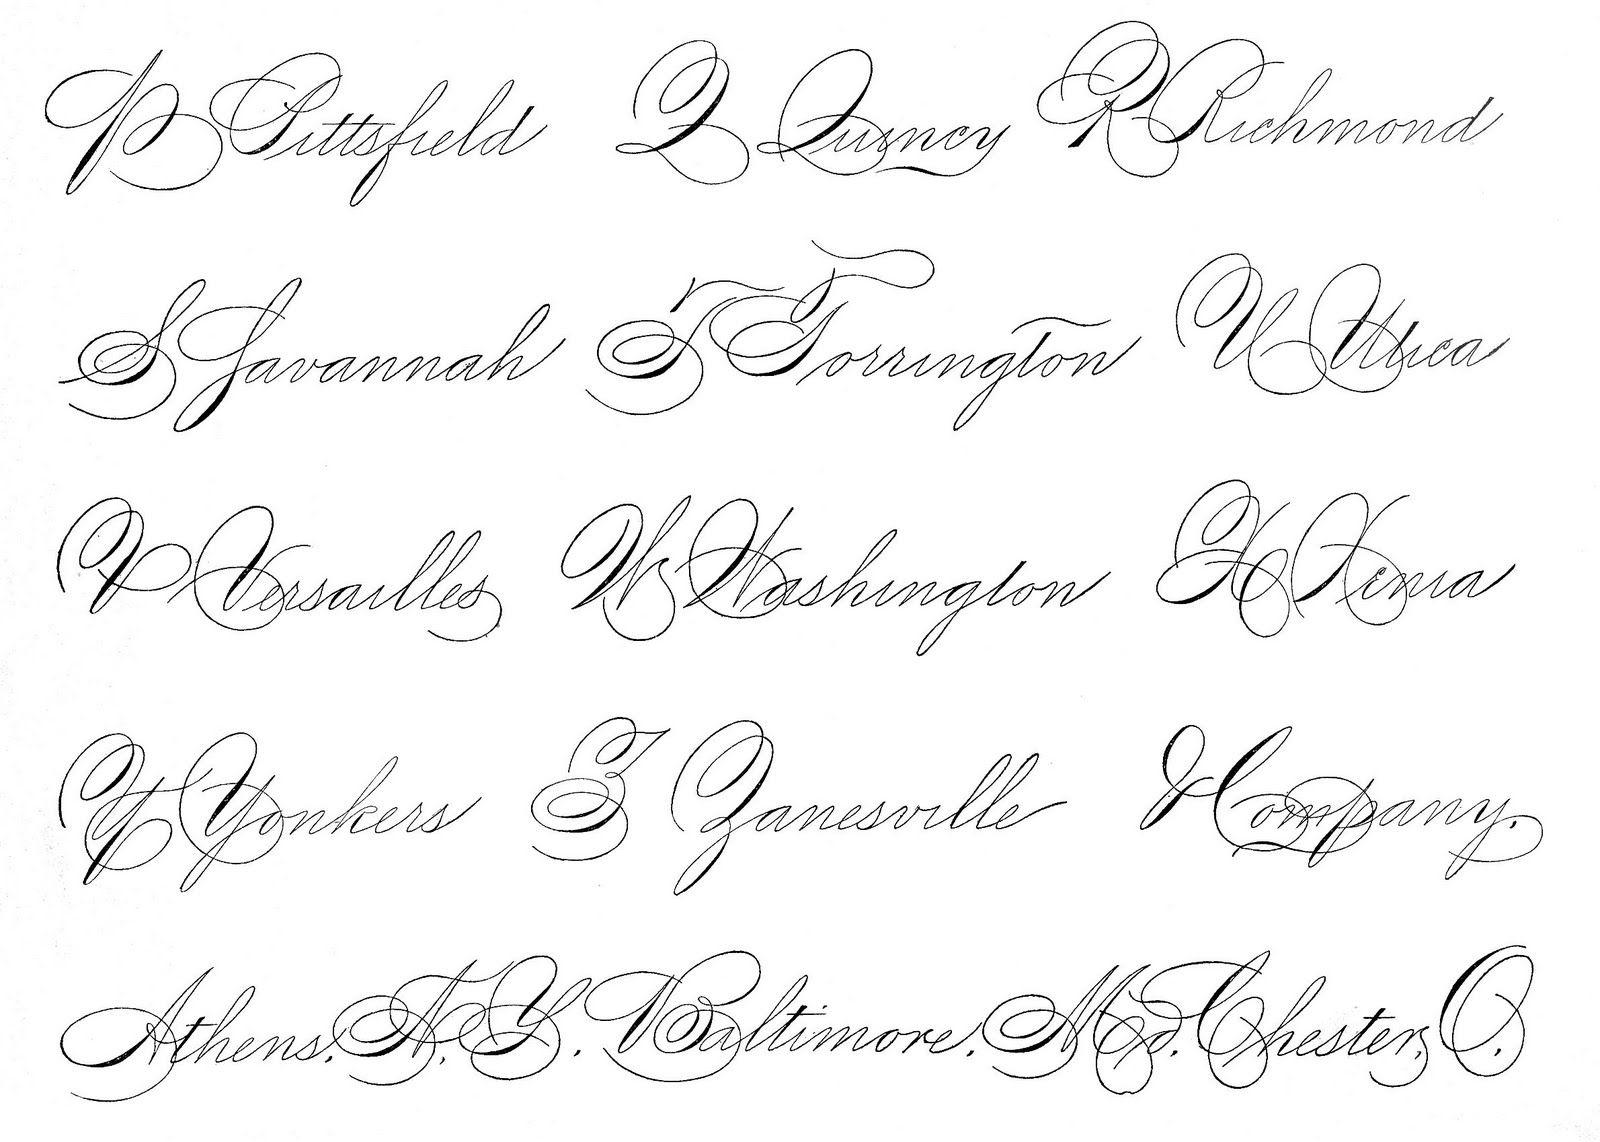 Spencerian Saturday Pen Flourished Words Calligraphy Penmanship